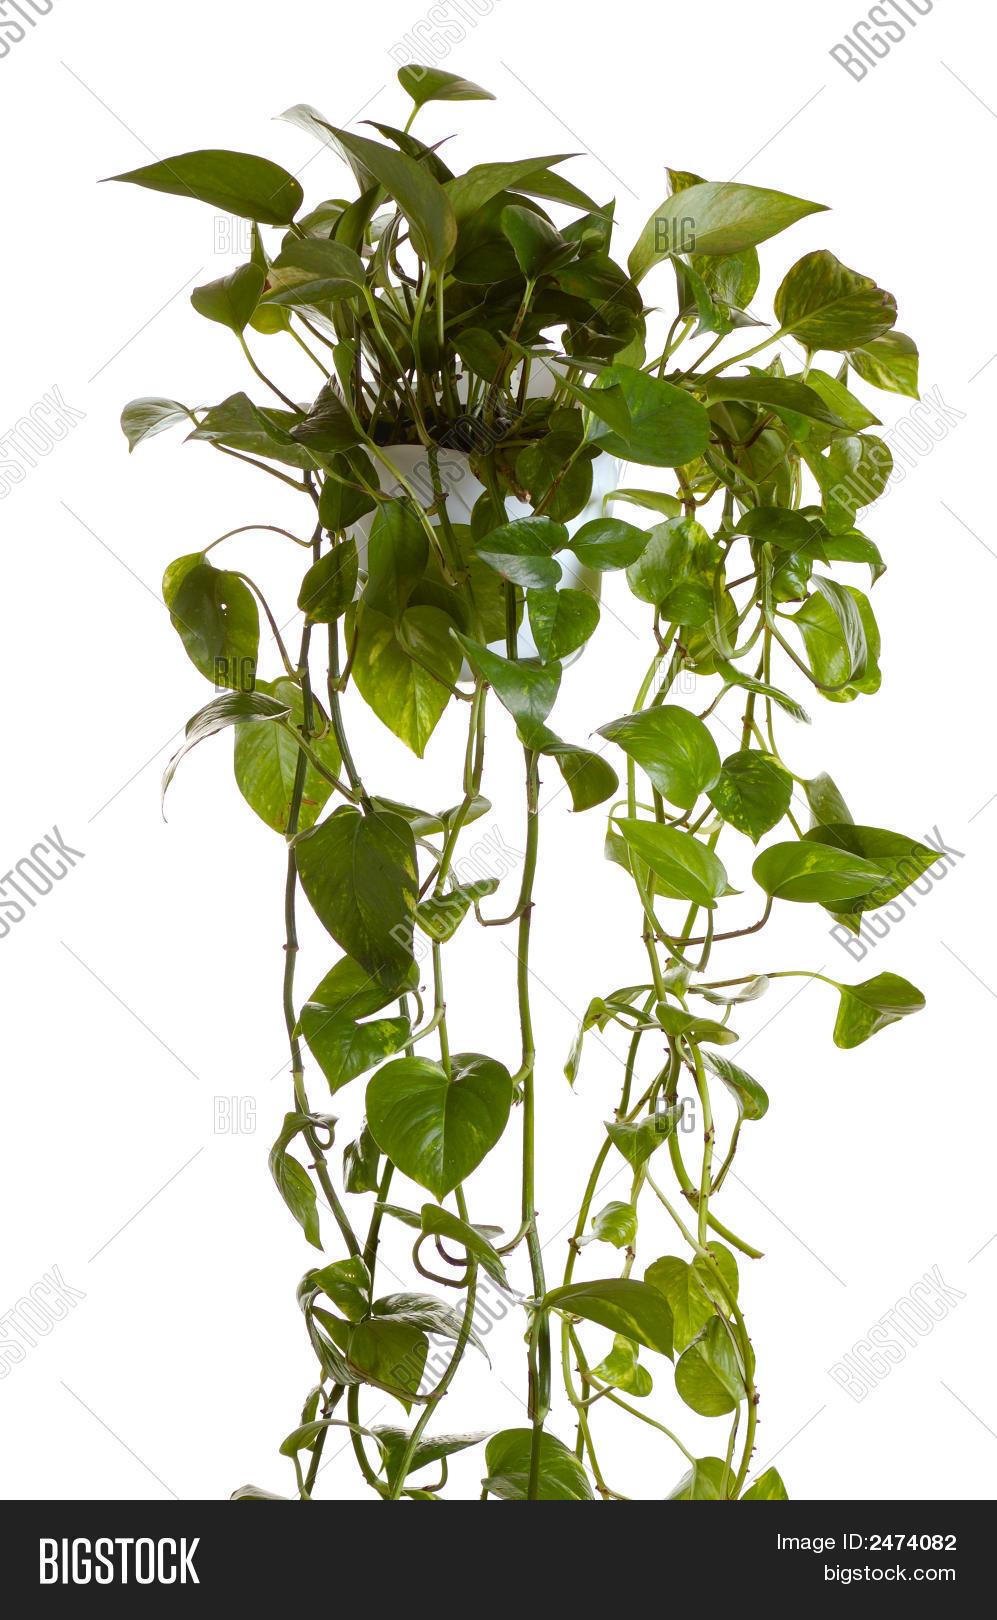 Домашний цветок лиана фото